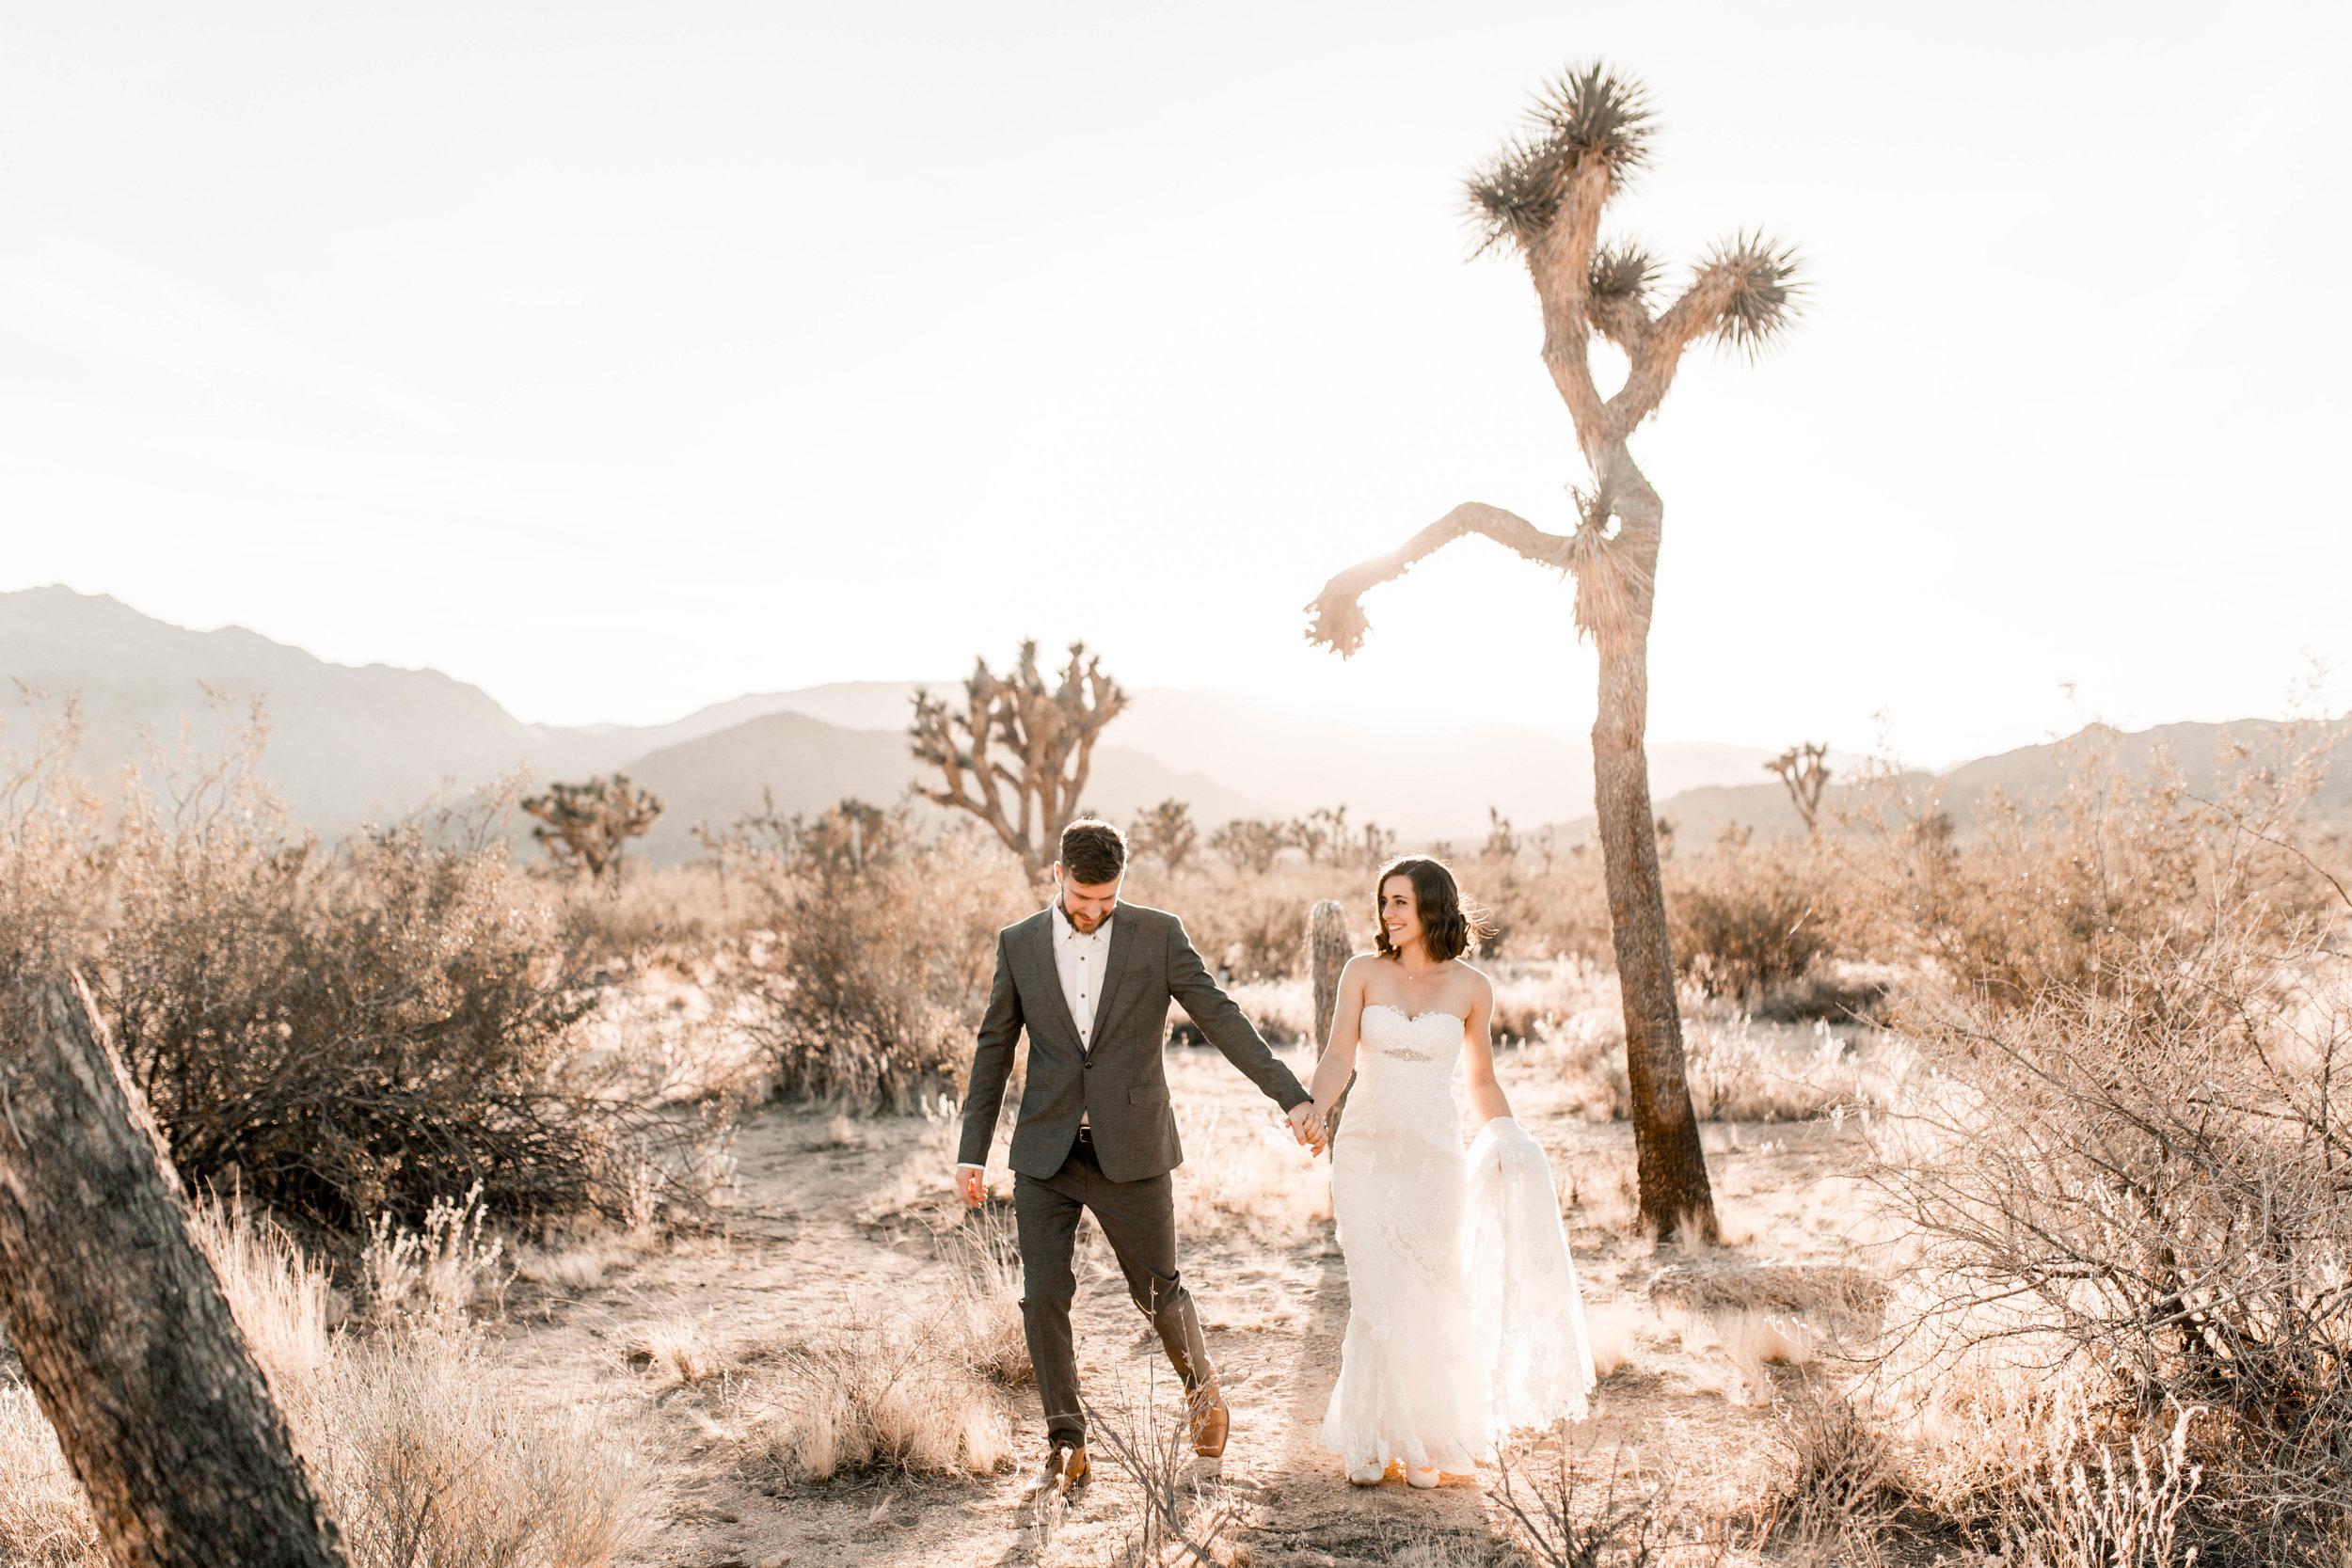 nicole-daacke-photography-joshua-tree-adventurous-elopement-wedding-national-park-wedding-photographer-adventure-wedding-adventurous-elopement-jtree-joshua-tree-national-park-wedding-photographer-intimate-weddings-golden-desert-love-15.jpg